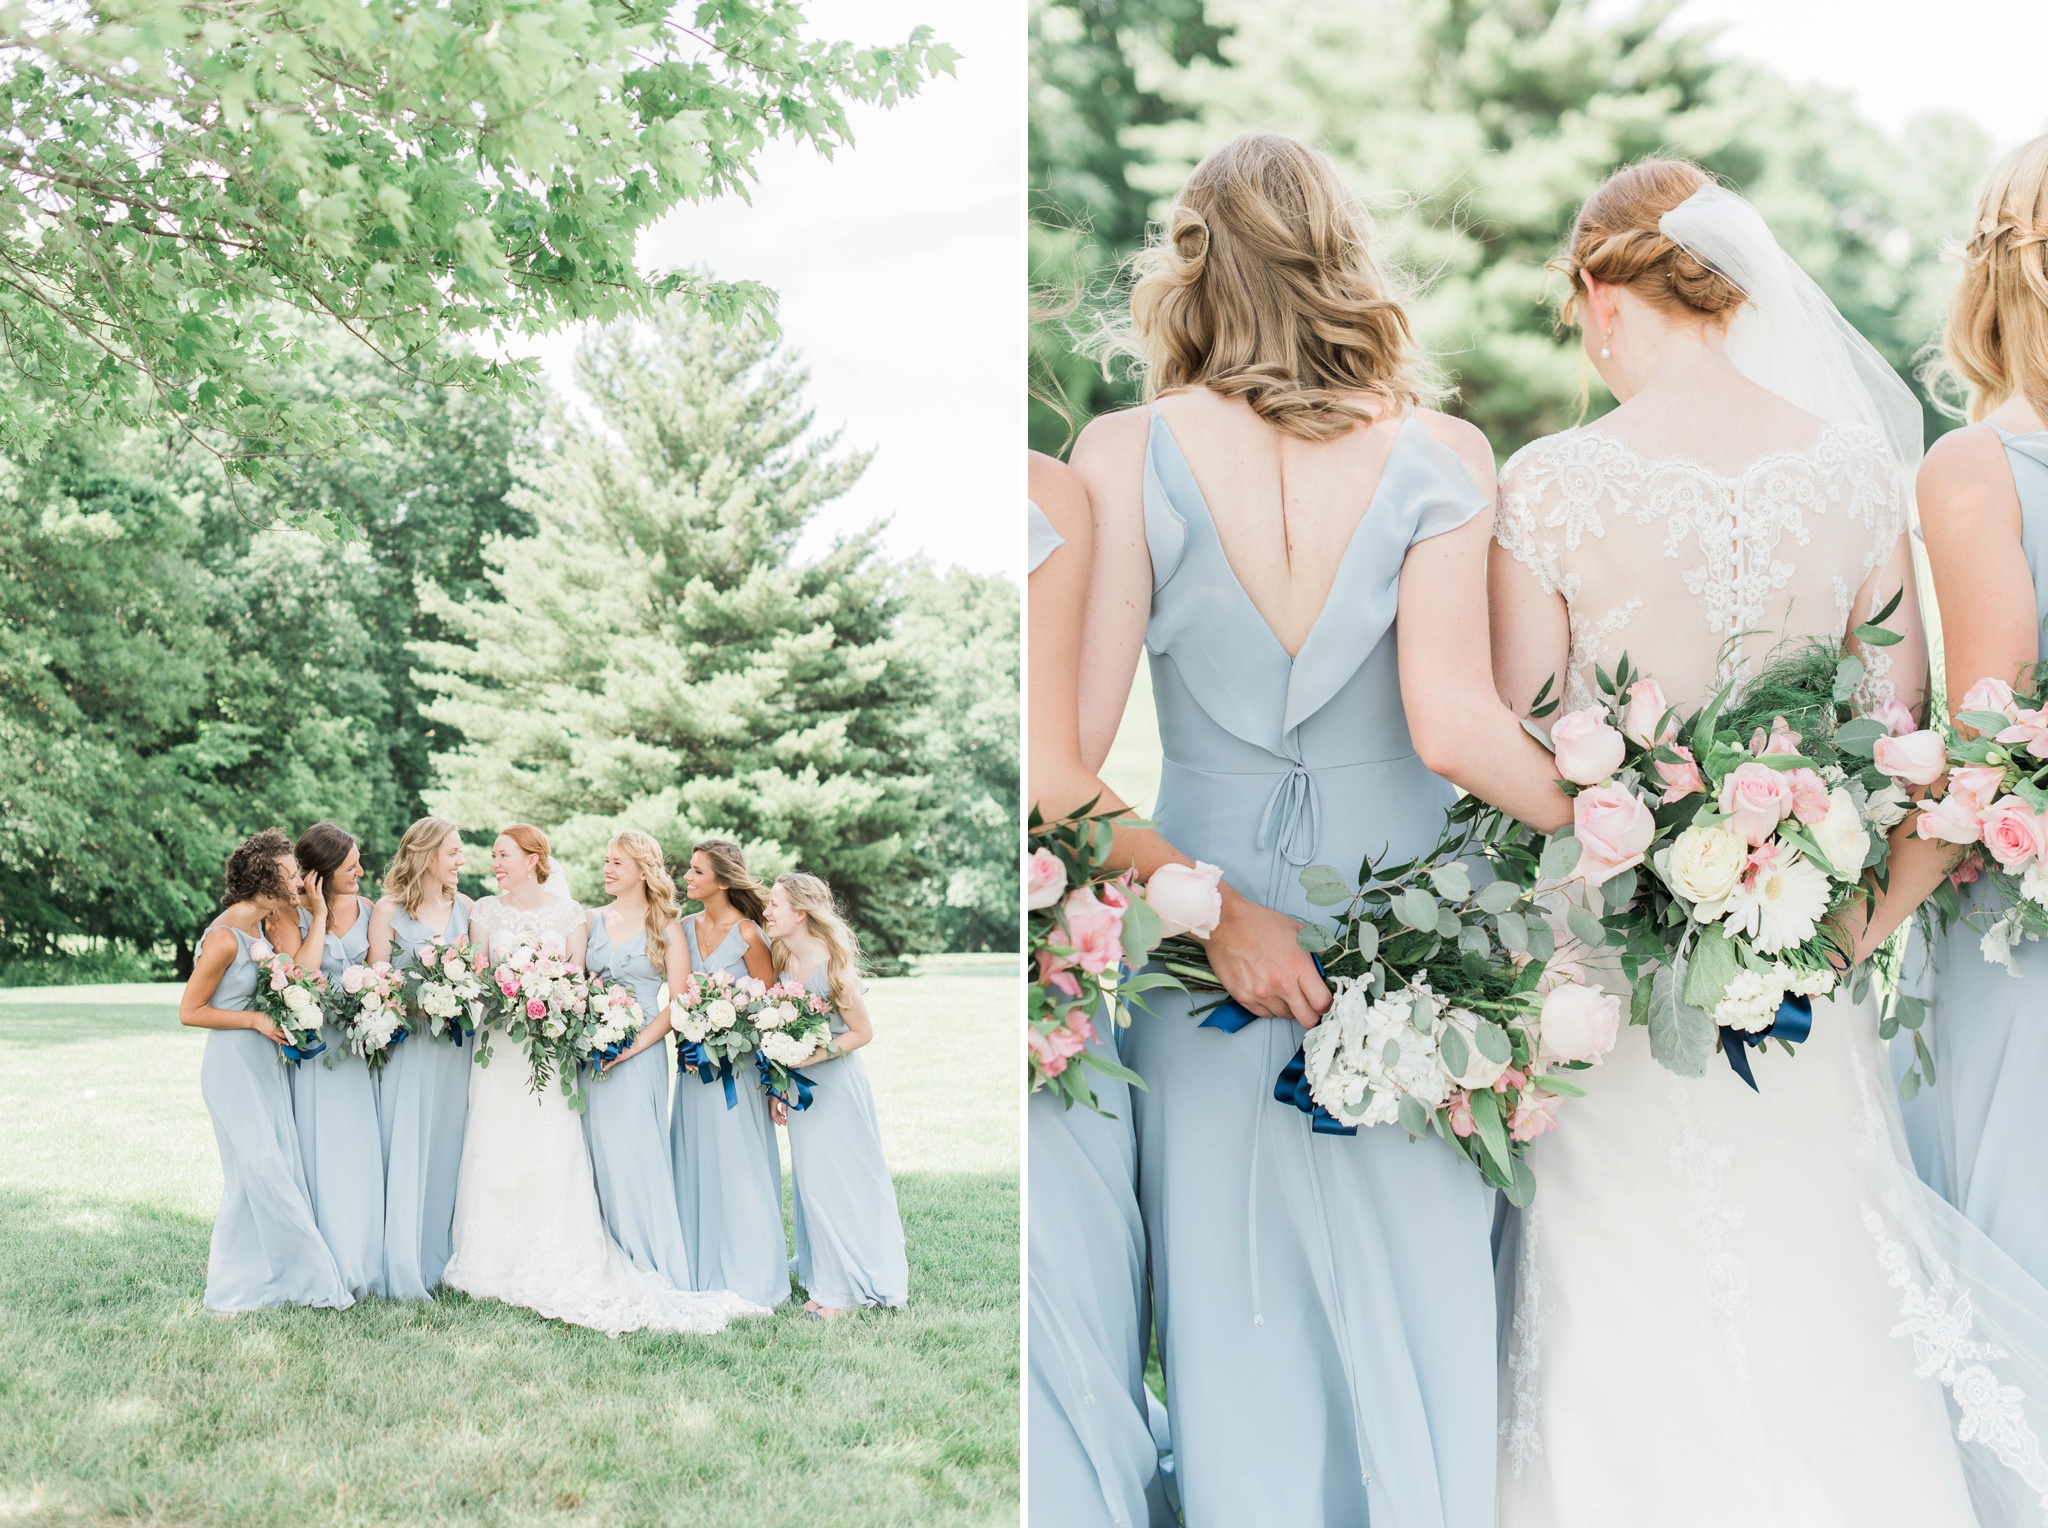 sunbury-ohio-wedding-hannah-johnathan_0043.jpg